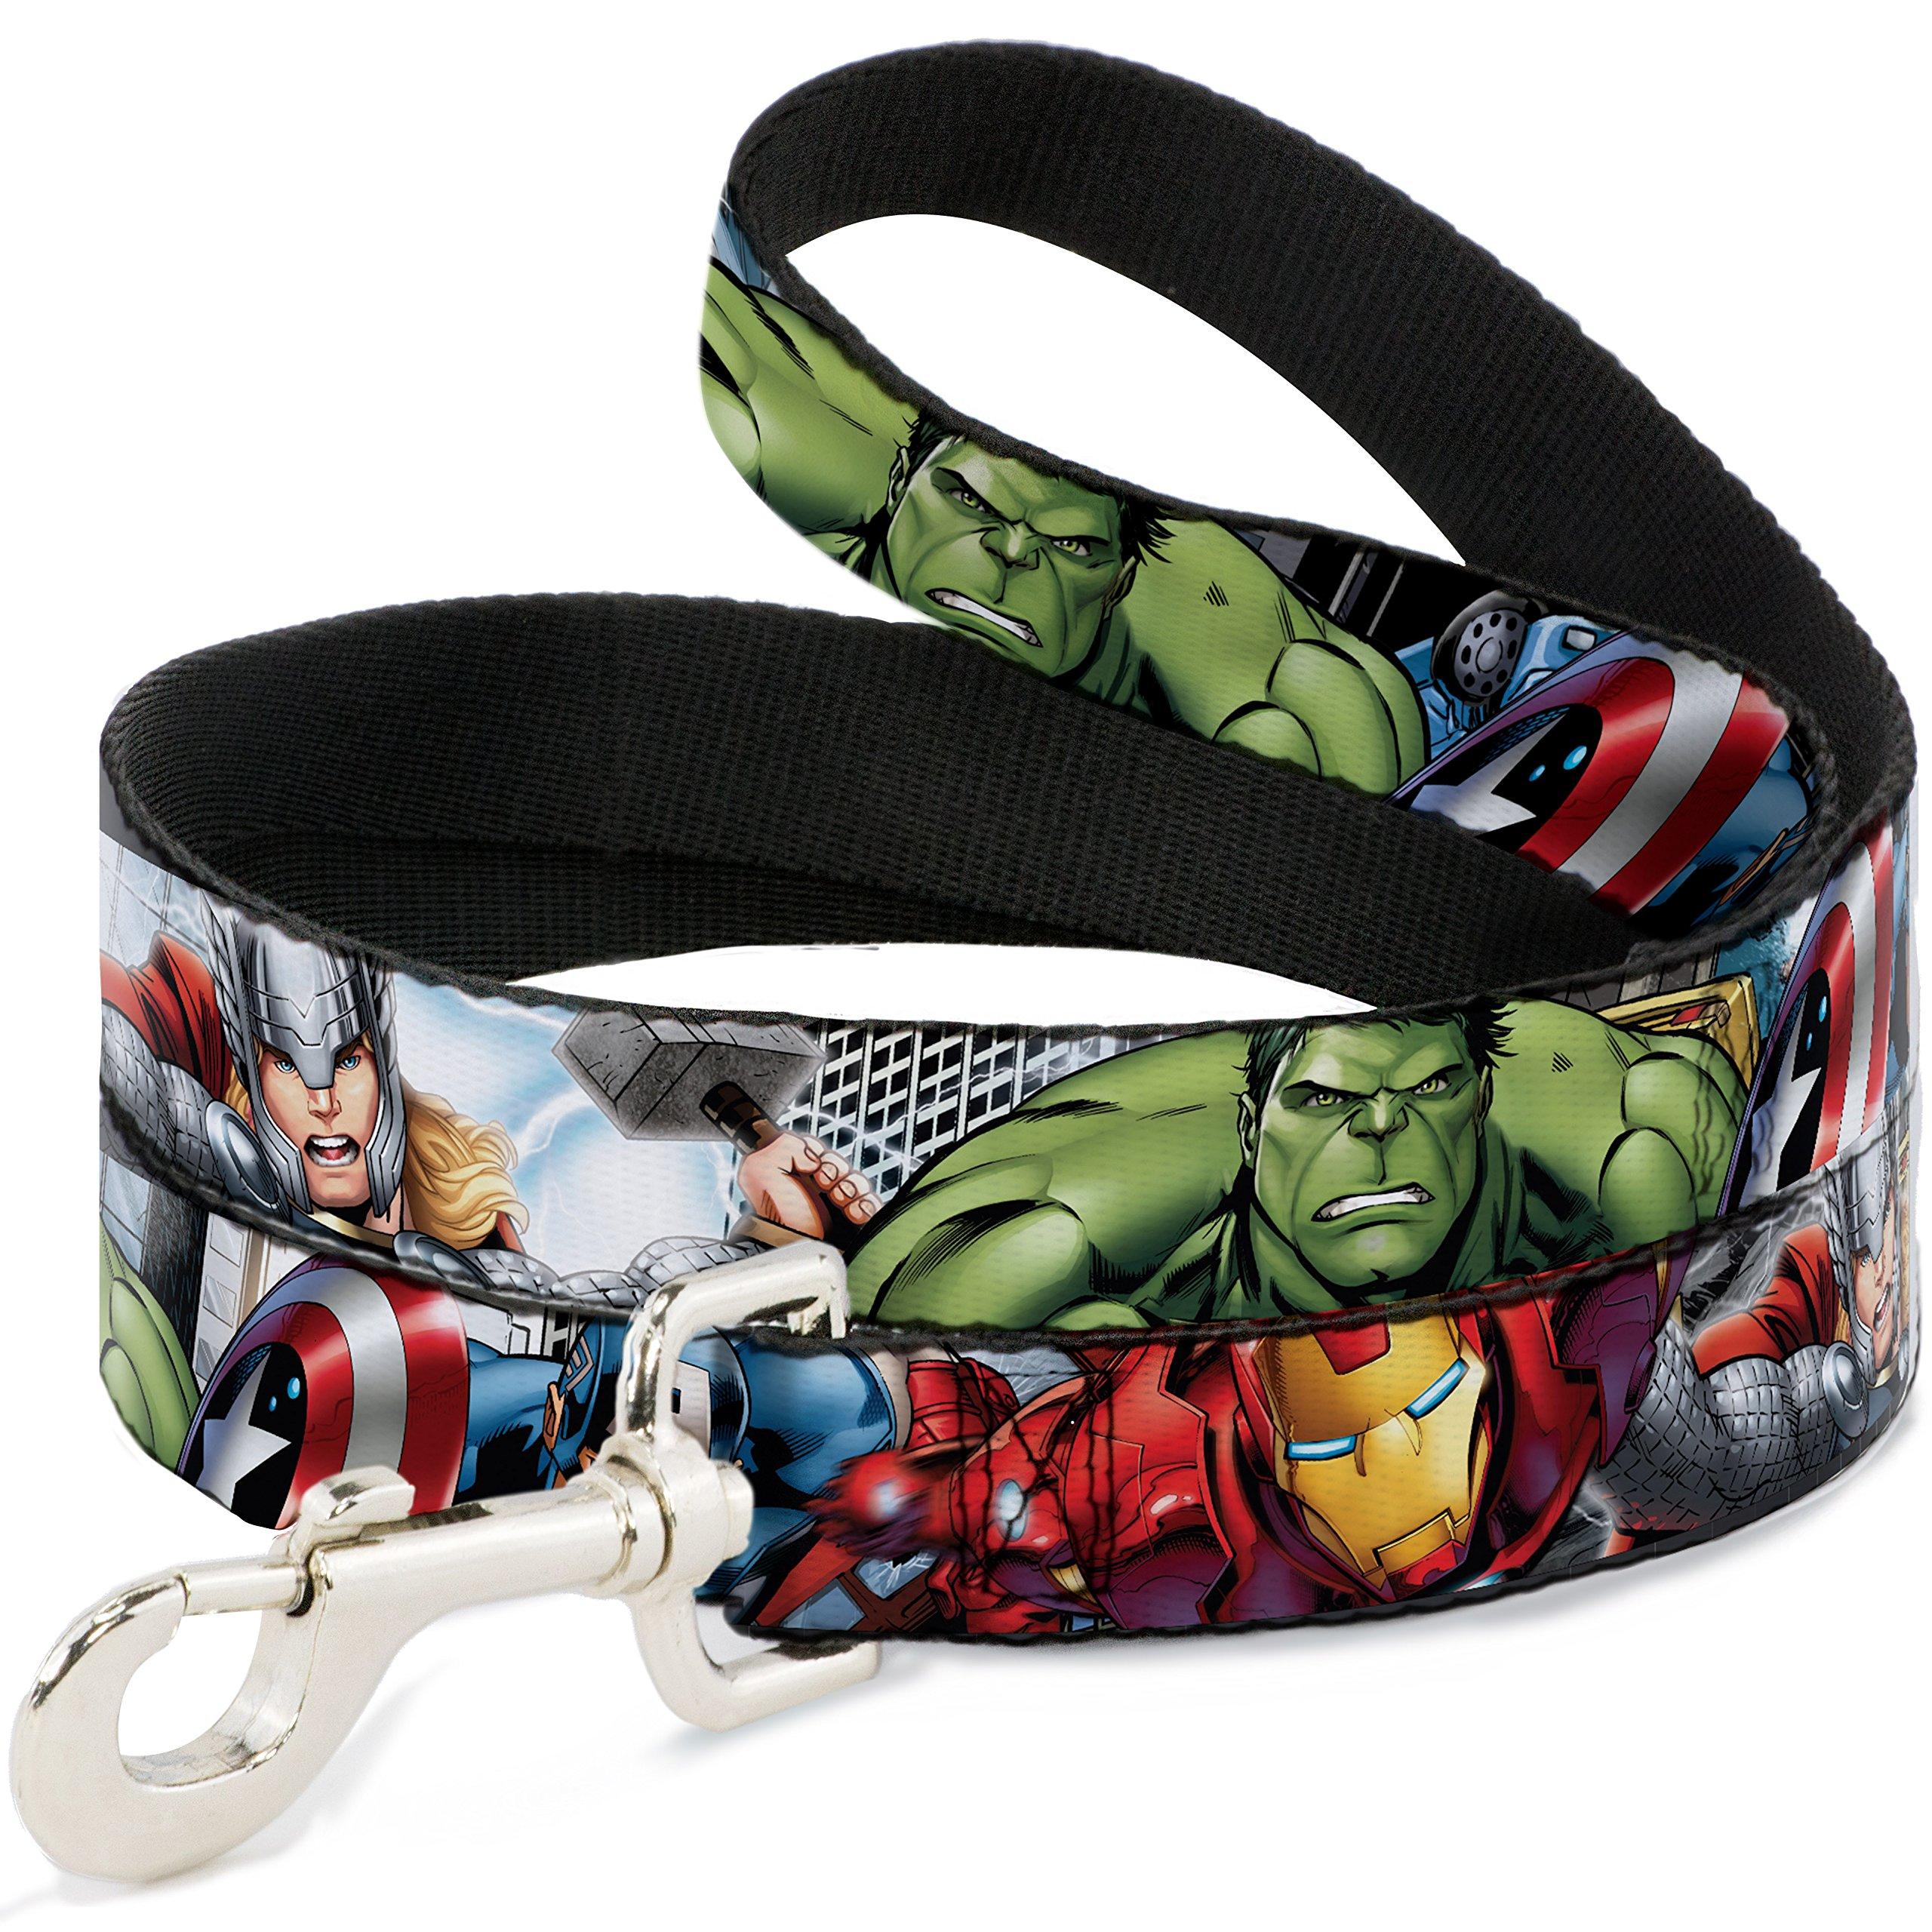 Buckle Down Dog Leash Marvel Avengers 4 Superhero Poses Close Up 6 Feet Long 1.0 Inch Wide